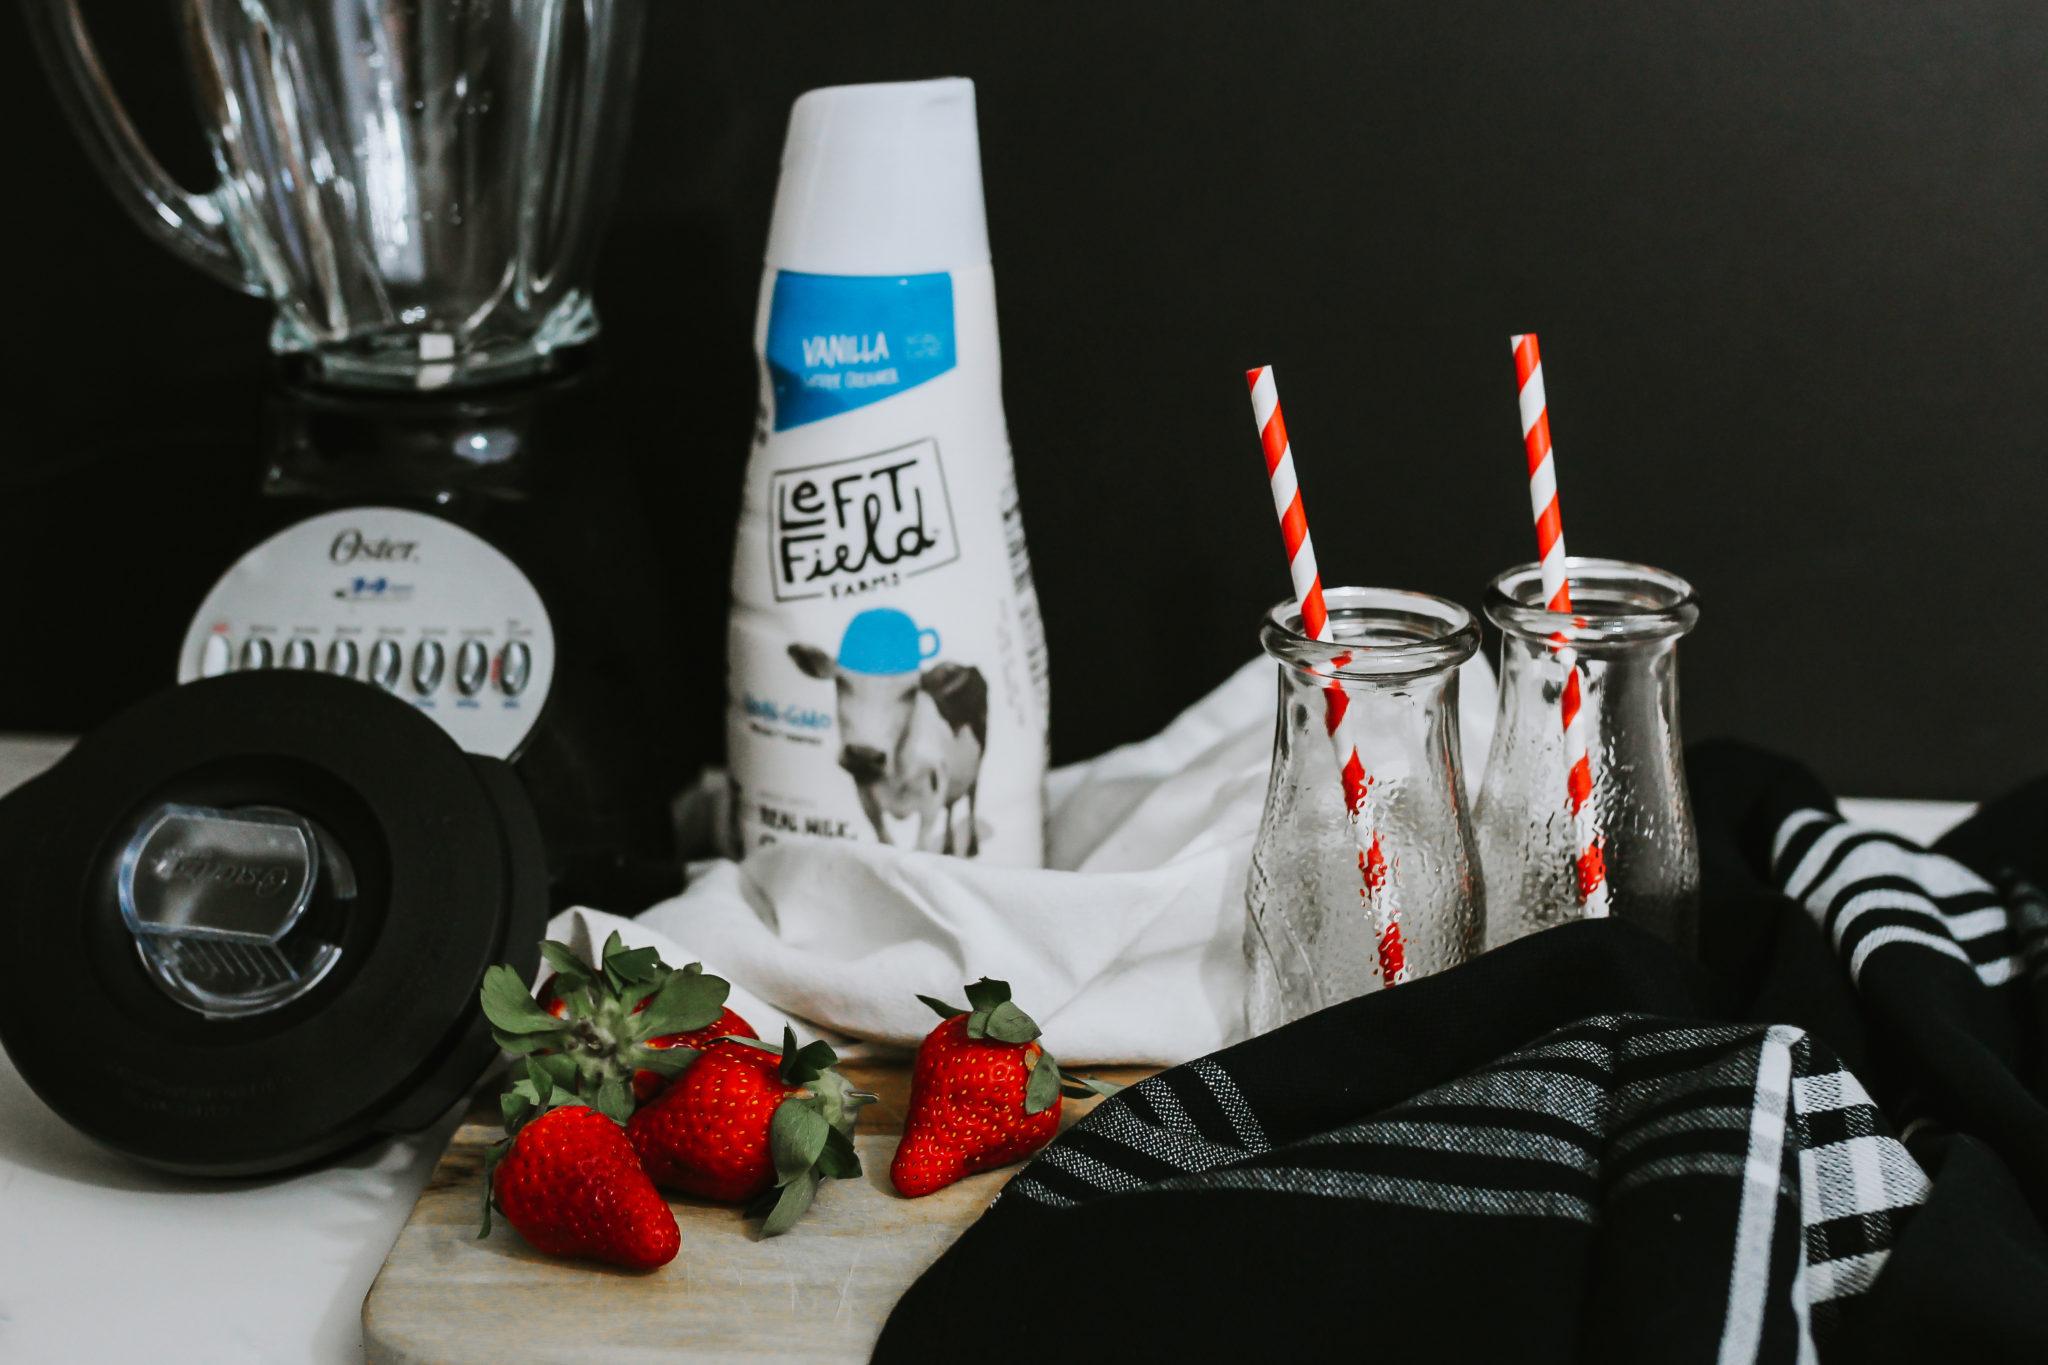 #AD #LeftFieldFarms Thick, creamy Strawberry and Cream Milkshake made with non-GMO vanilla coffee creamer instead of ice cream. Learn more srcset=